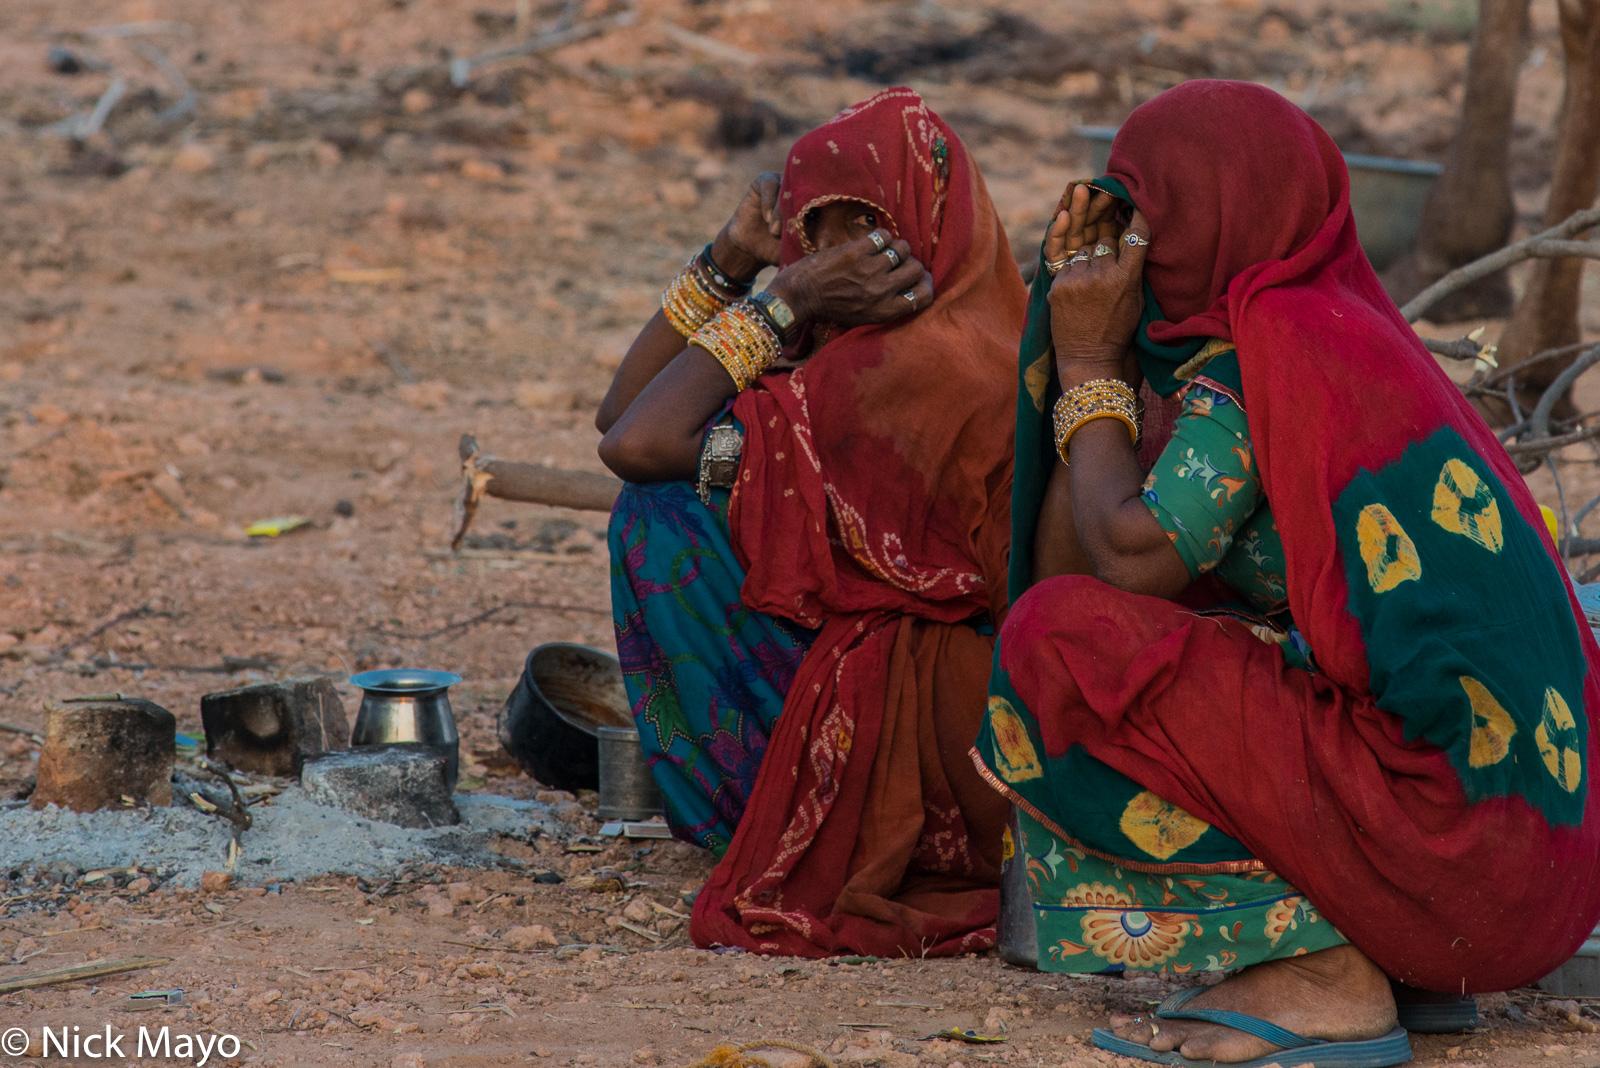 Bangle, Festival, India, Rajasthan, Ring, photo